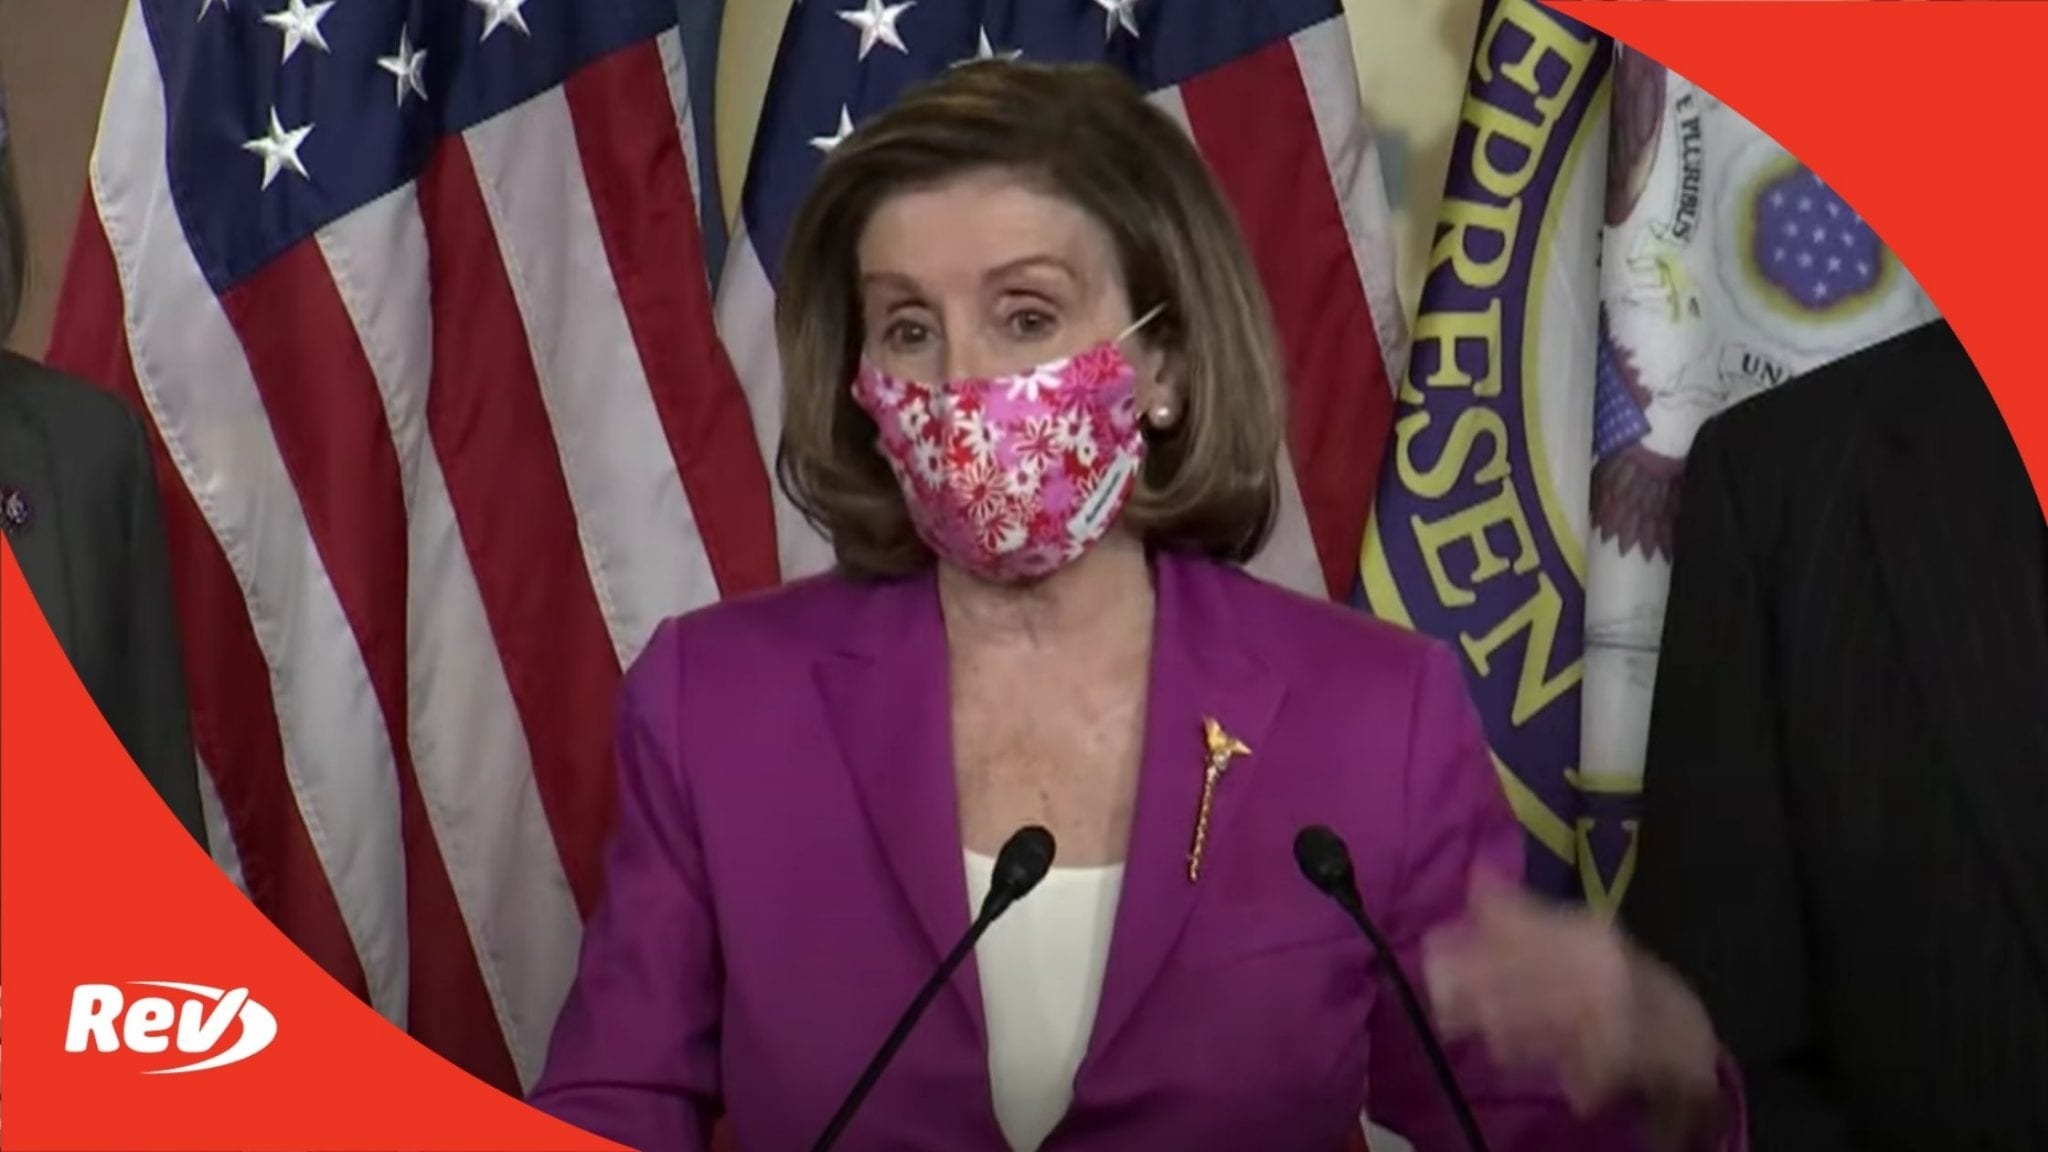 Nancy Pelosi, House Democrats Press Conference Before Voting on American Rescue Plan Transcript March 9